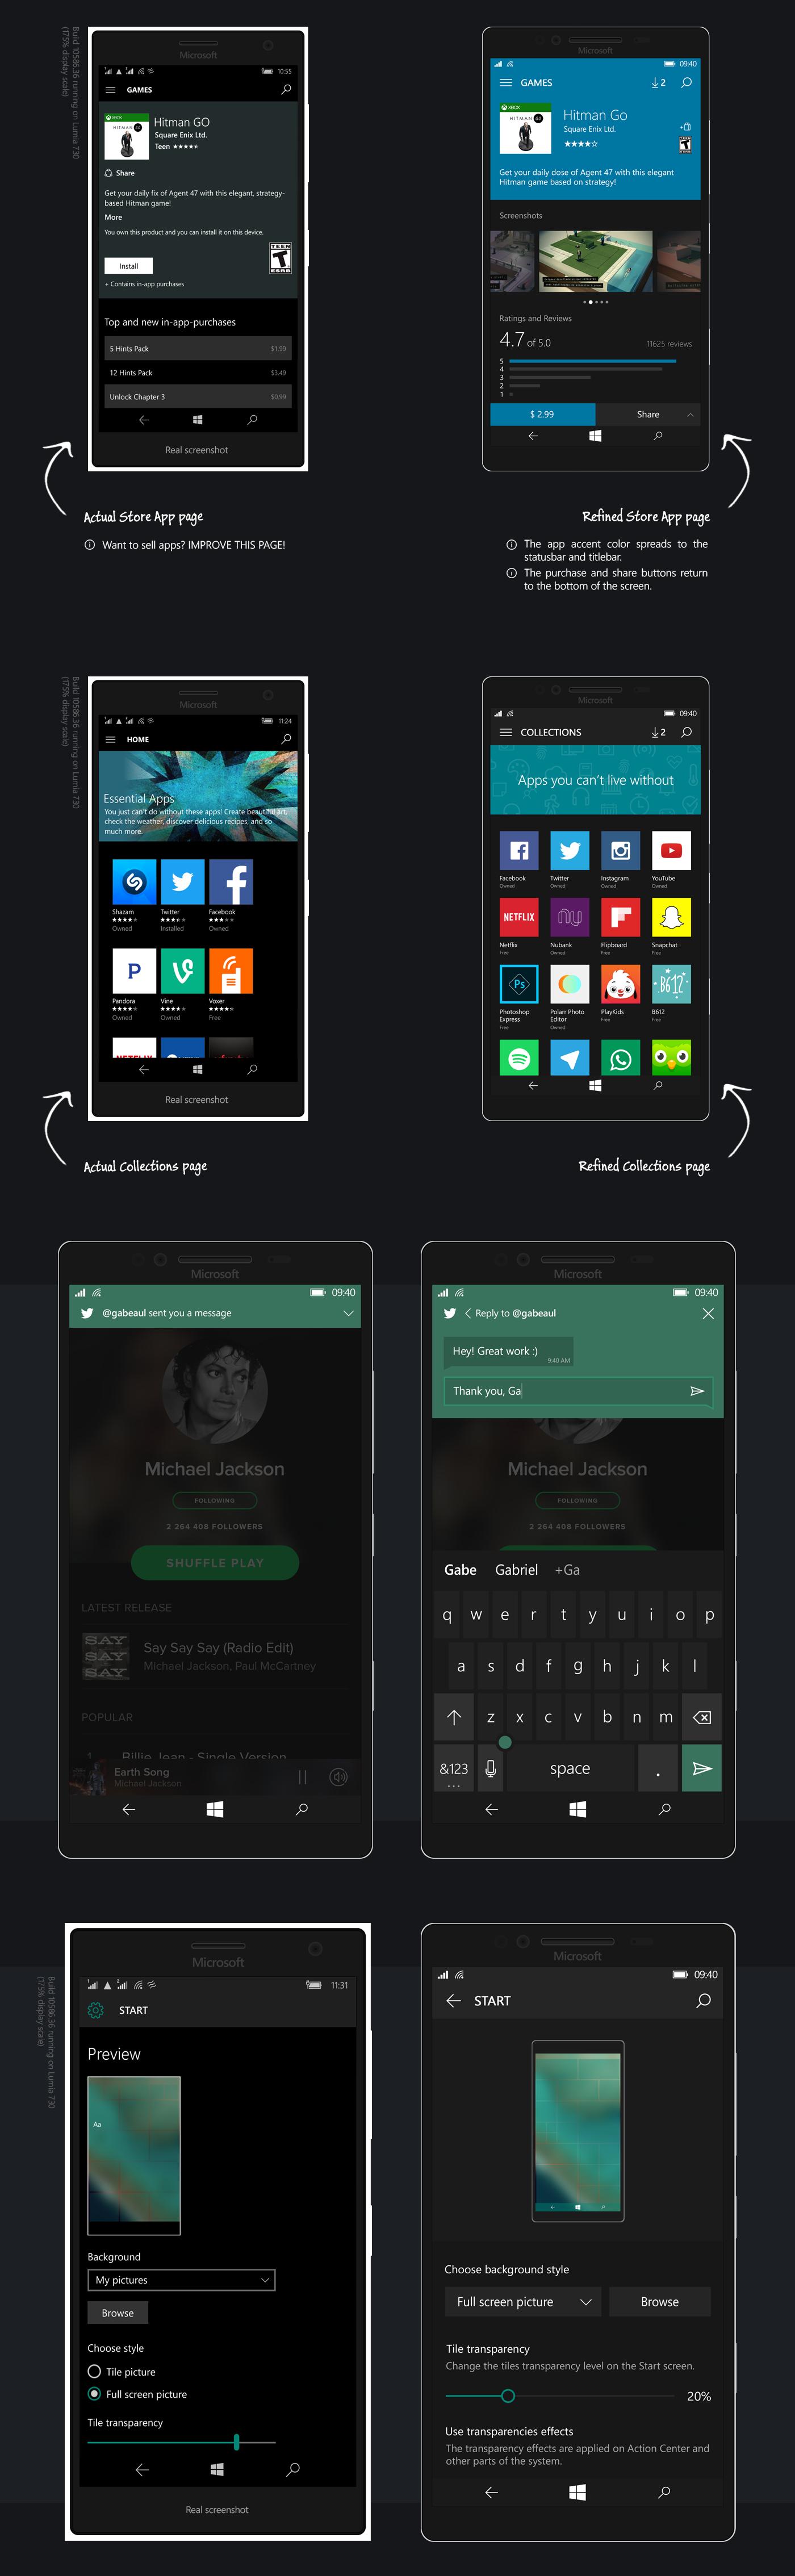 windows windows 10 mobile windows mobile windows 10 Microsoft concept design UI ux GUI user experience user interface phone windows phone lumia